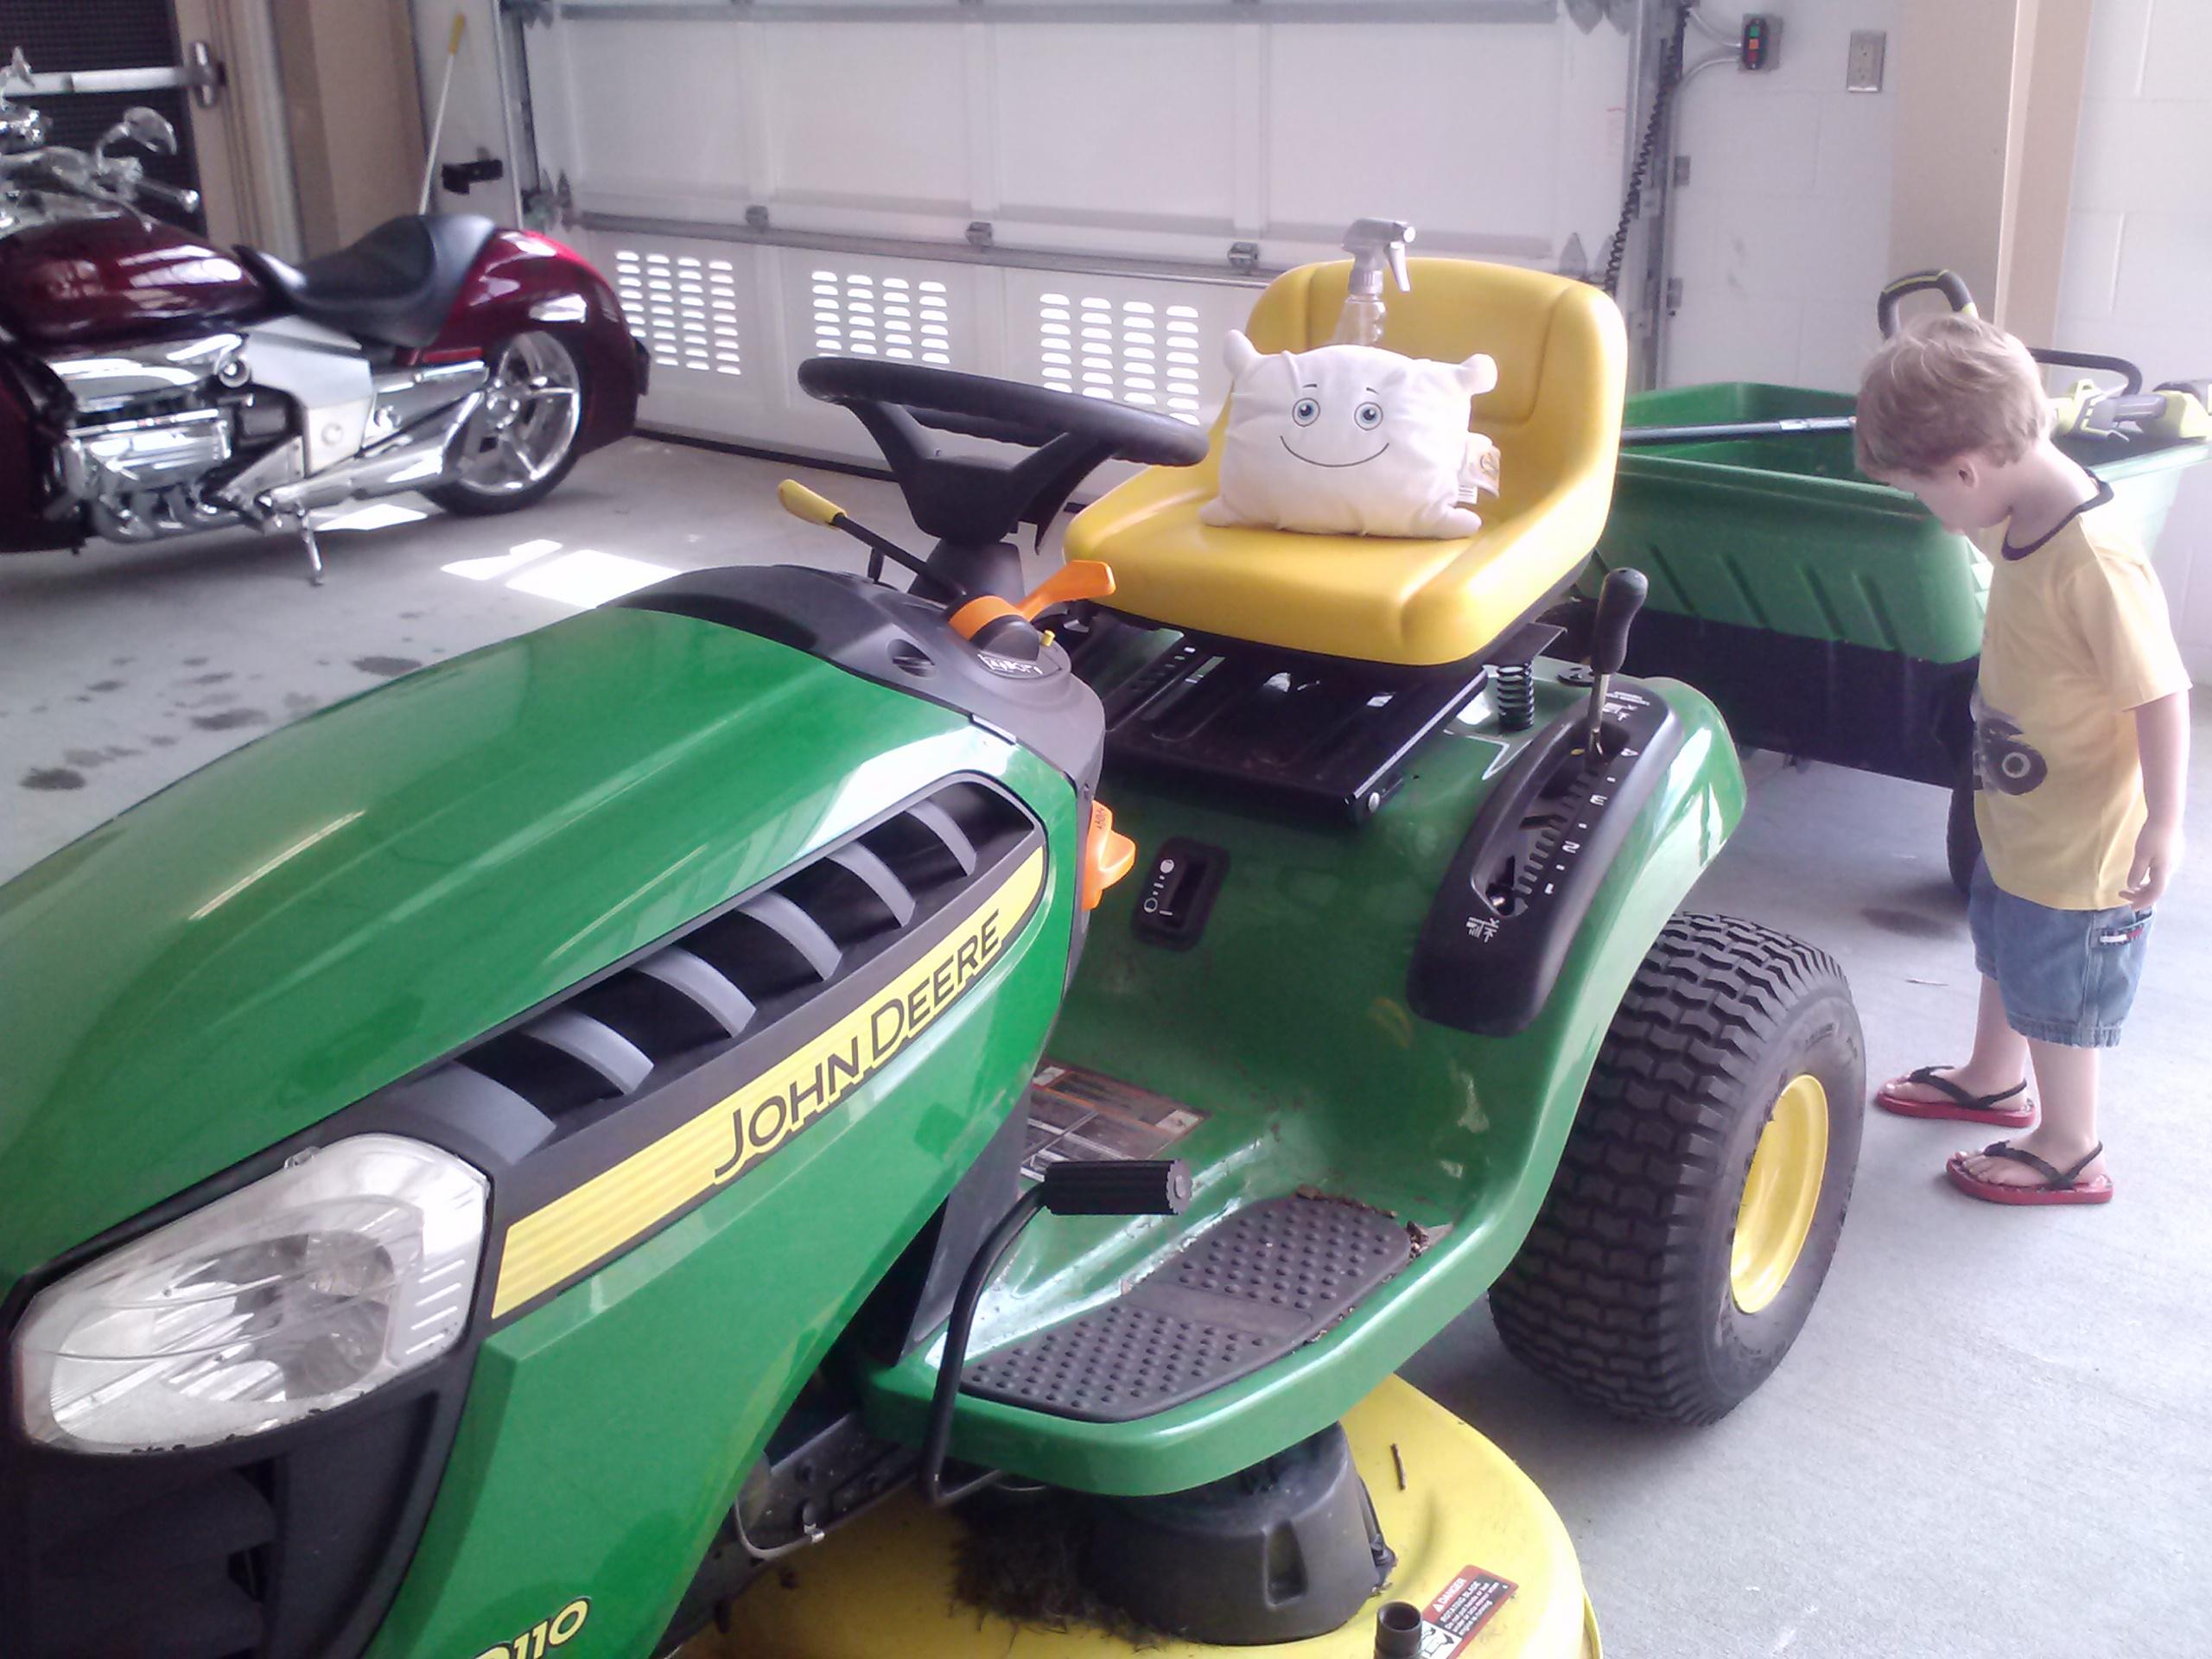 McStuffy checks out the firehouse lawn mower